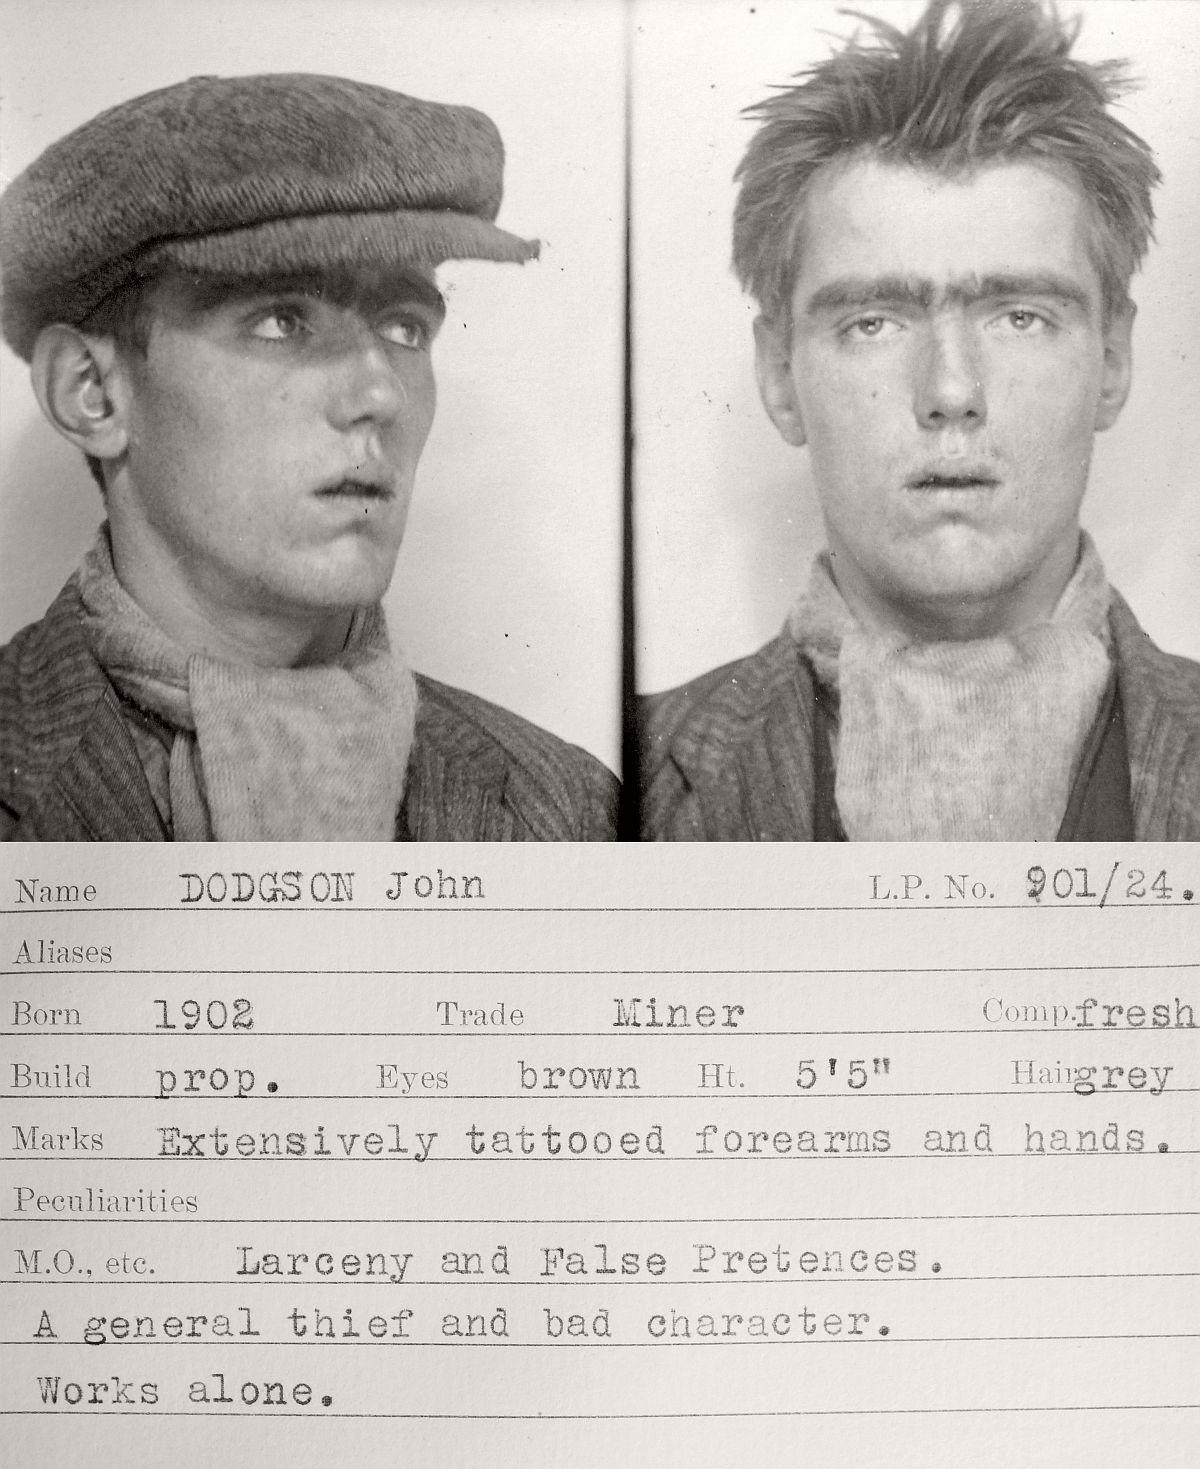 vintage-mug-shot-of-criminals-from-newcastle-upon-tyne-1930s-11